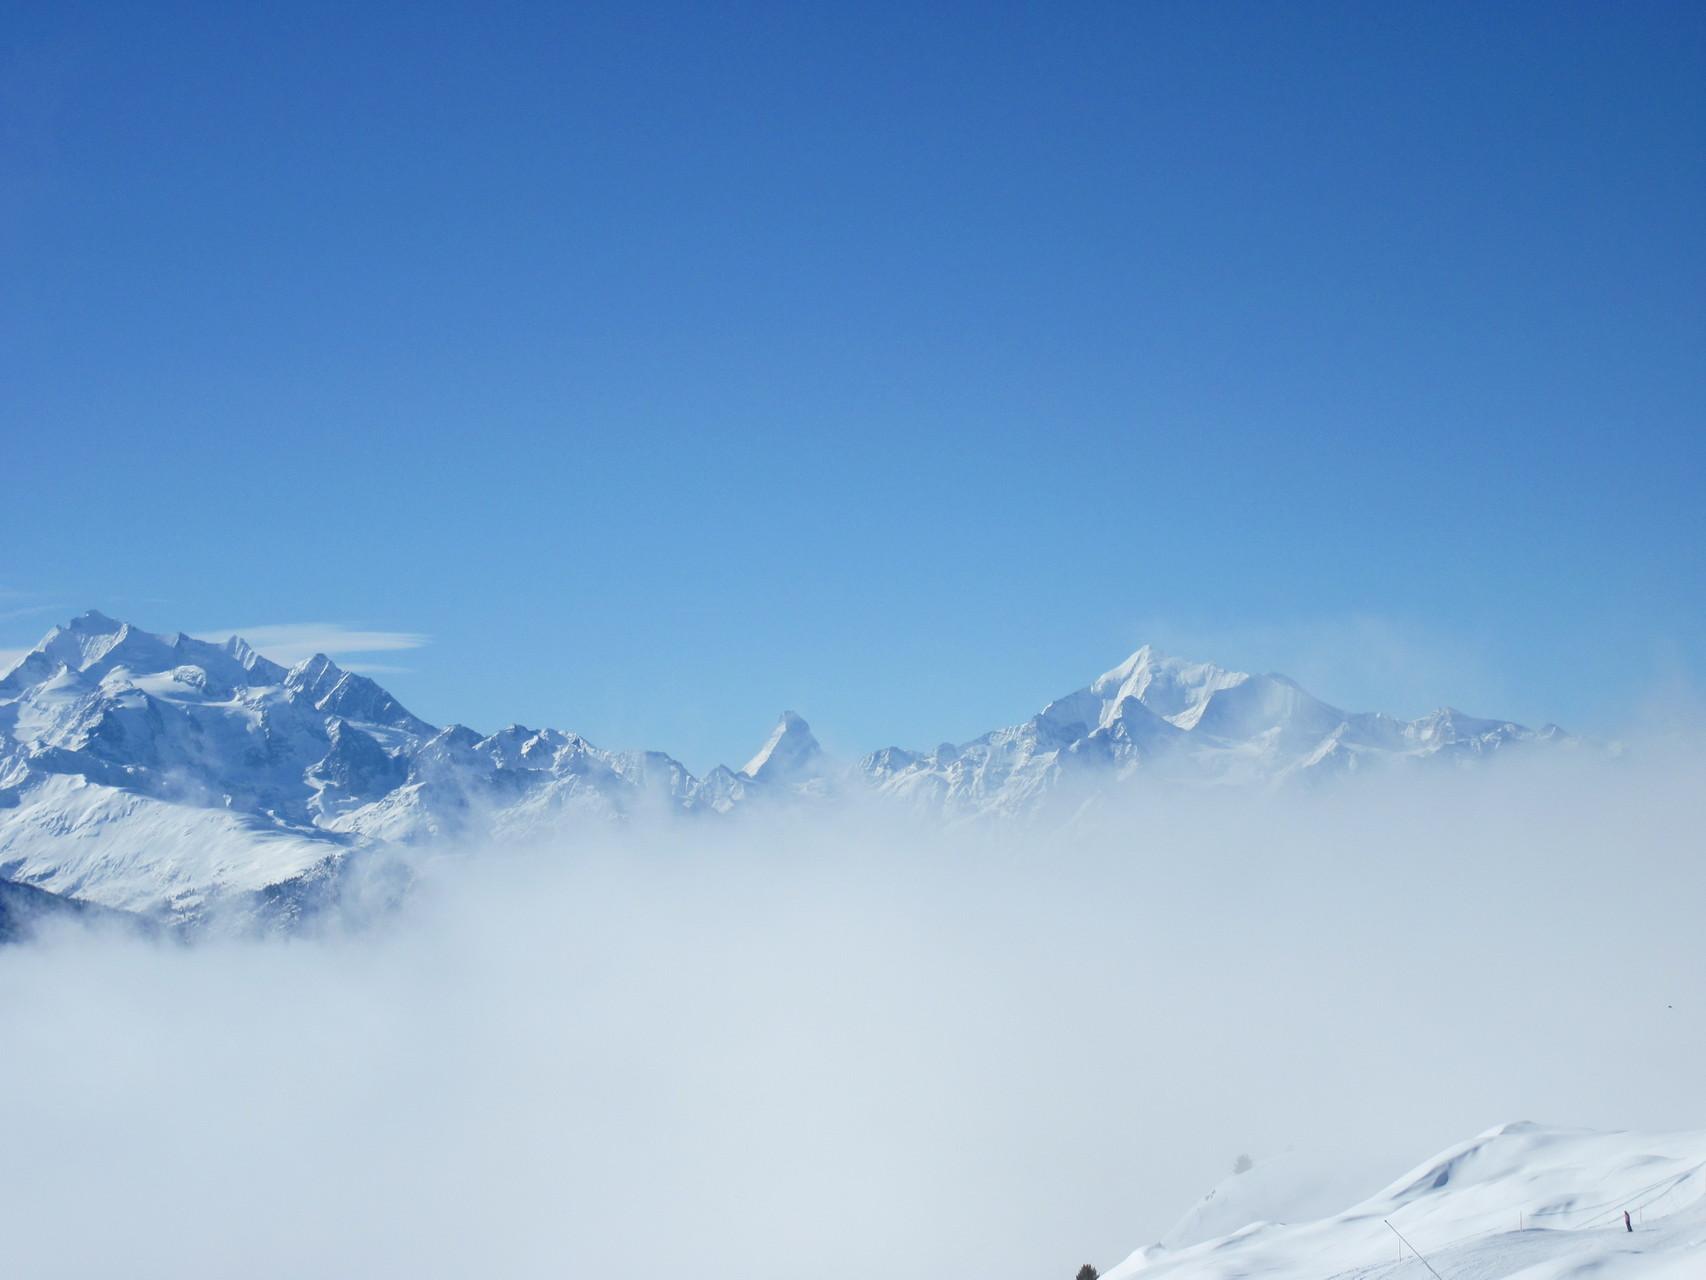 von links: Mischabelgruppe, Matterhorn, Weisshorn